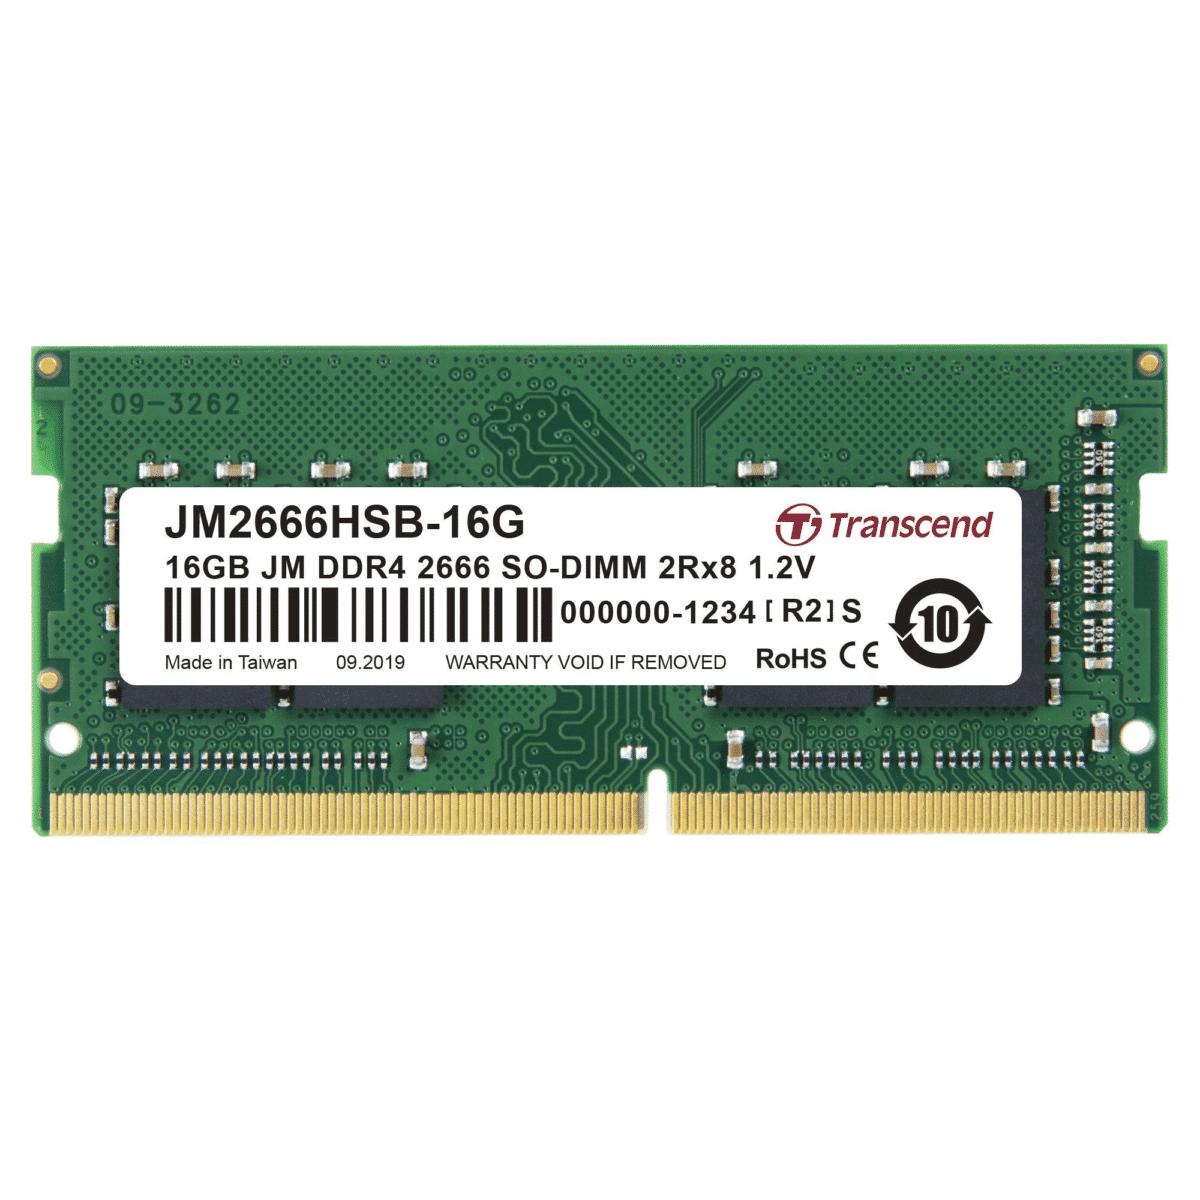 Transcend JetRam DDR4-2666 SO-DIMM 16GB JM2666HSB-16G